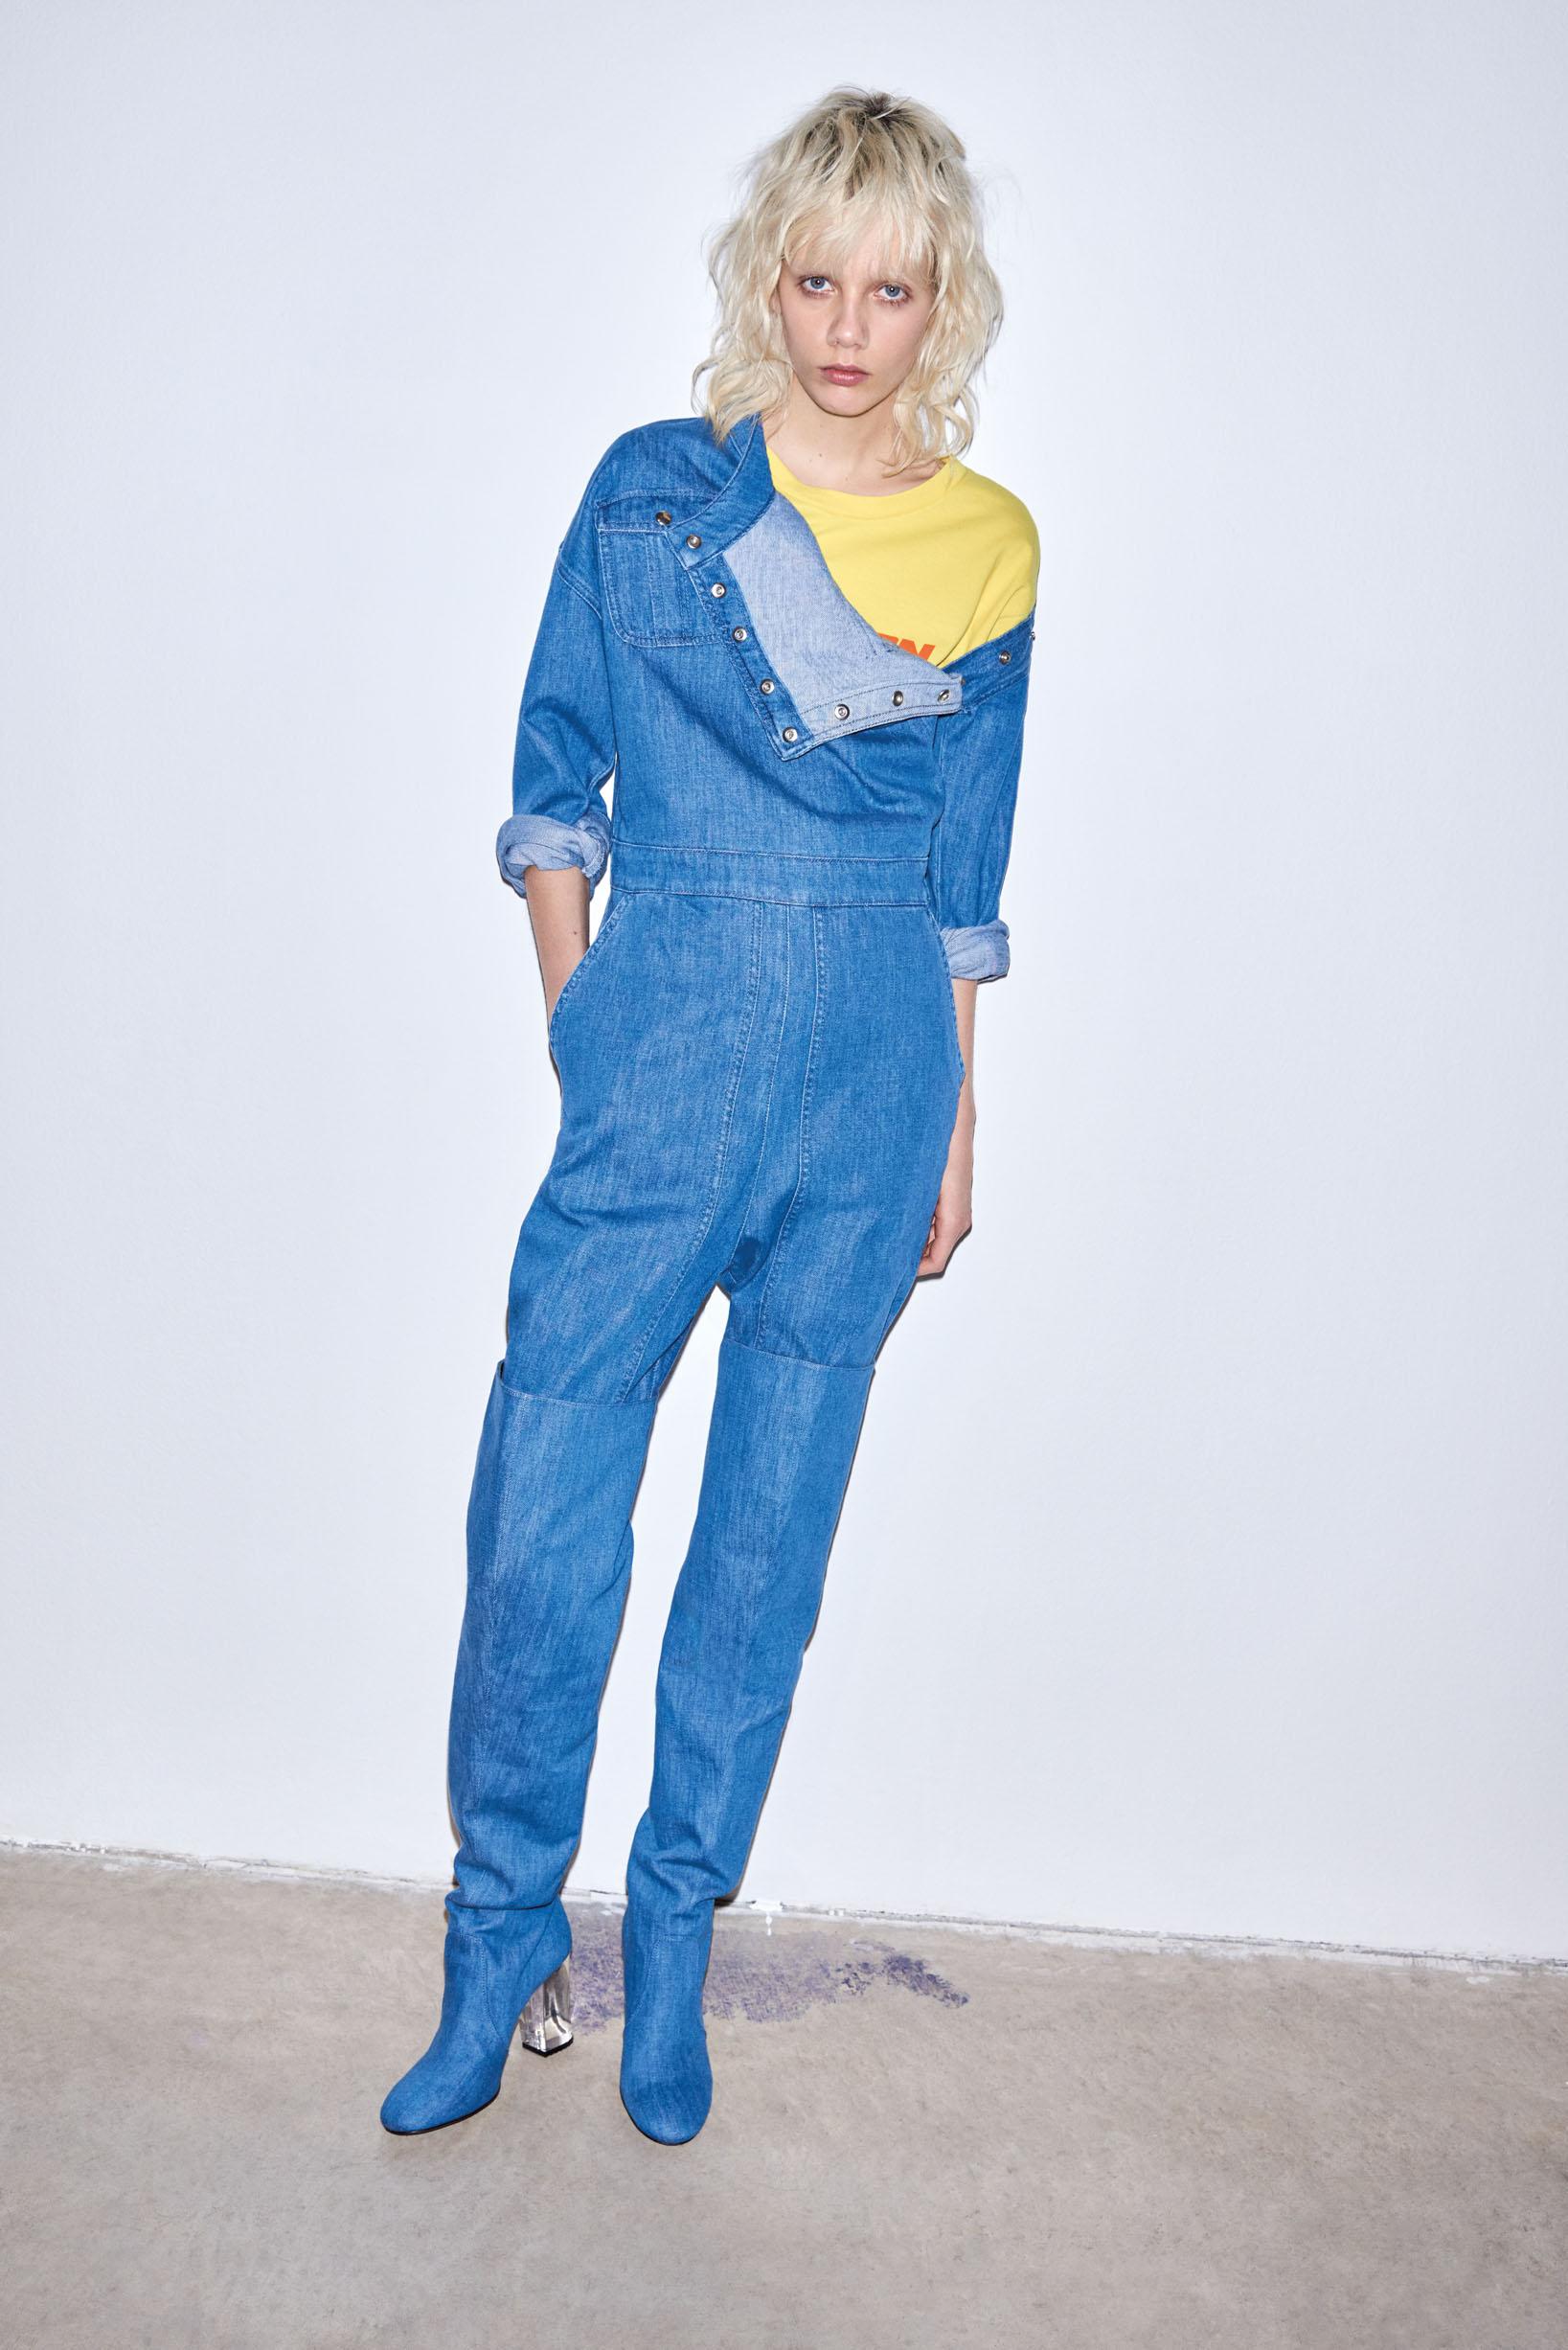 Pinko Jeans FW 17-18 Lookbook | Marco Pietracupa | Pinko | Sissy Vian | Numerique Retouch Photo Retouching Studio